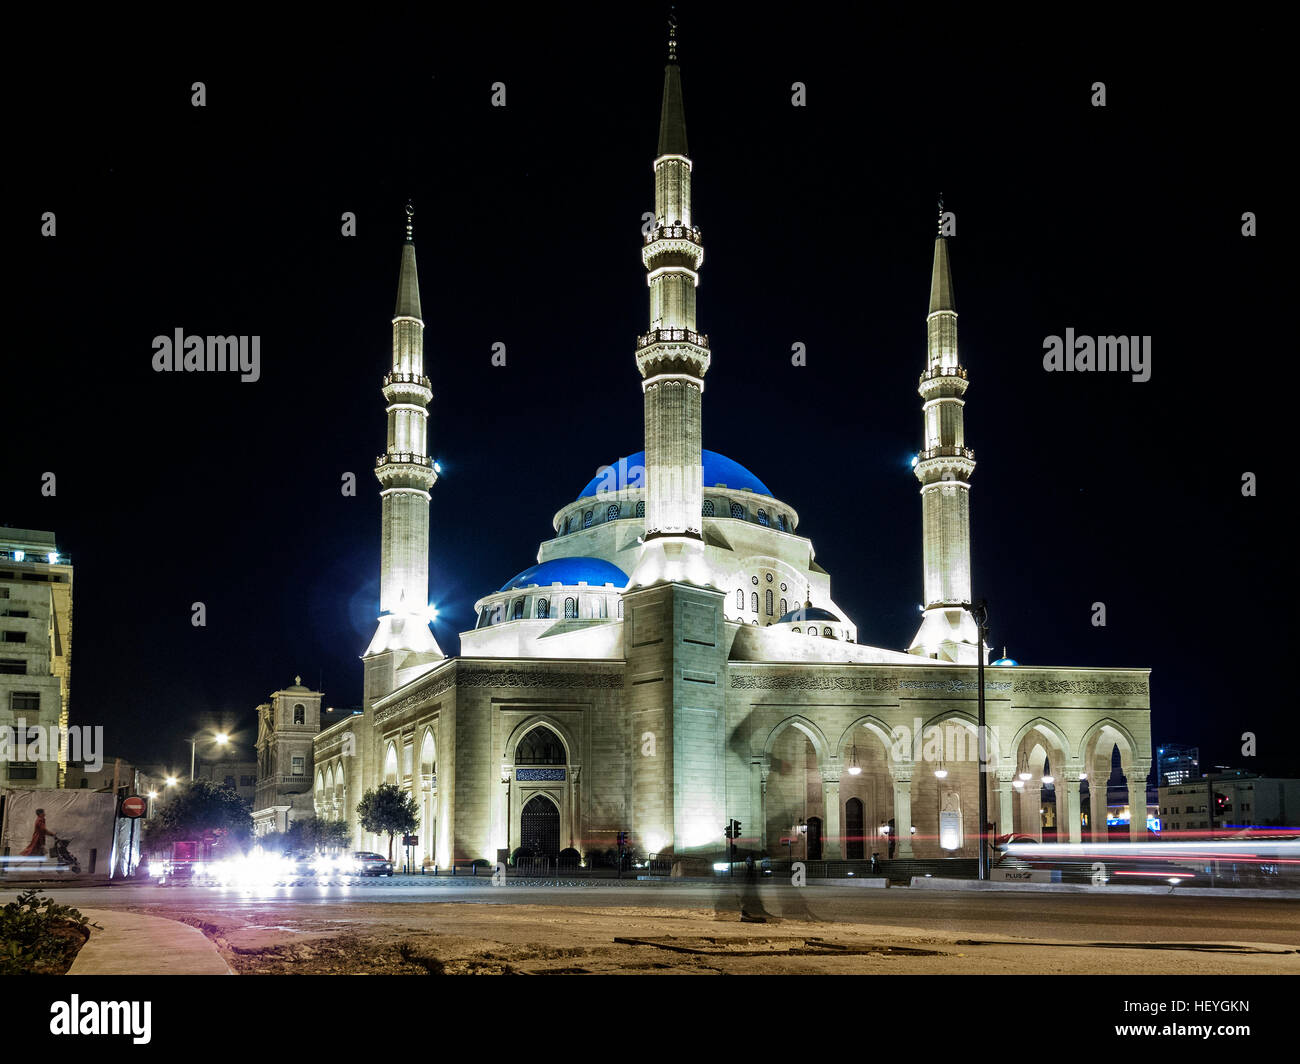 Mohammad Al Amin Mosque landmark in central Beirut city lebanon at night - Stock Image